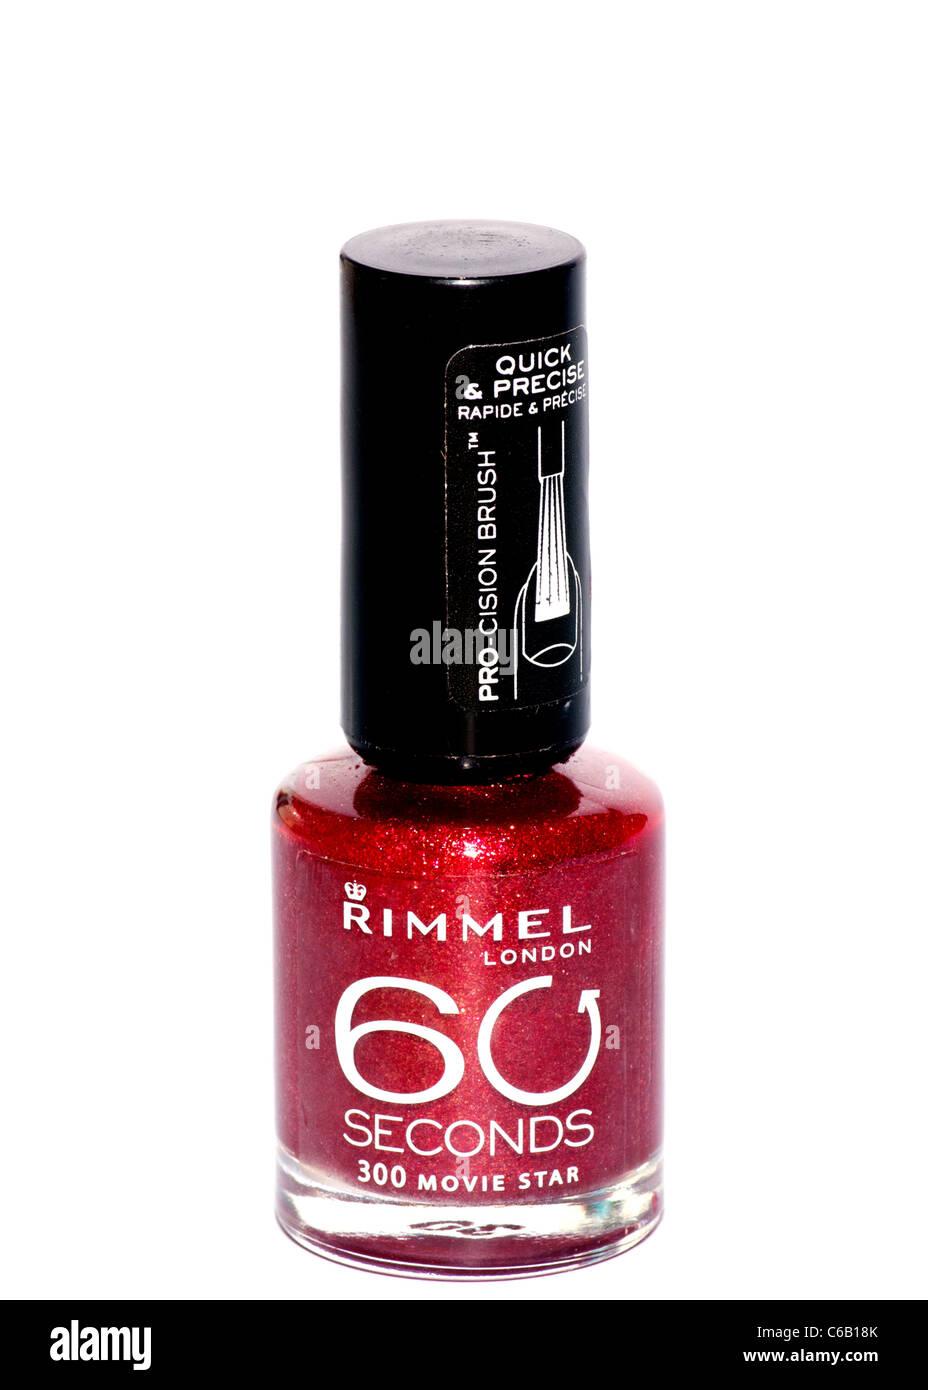 Bottle Of Rimmel London Nail Varnish - Stock Image